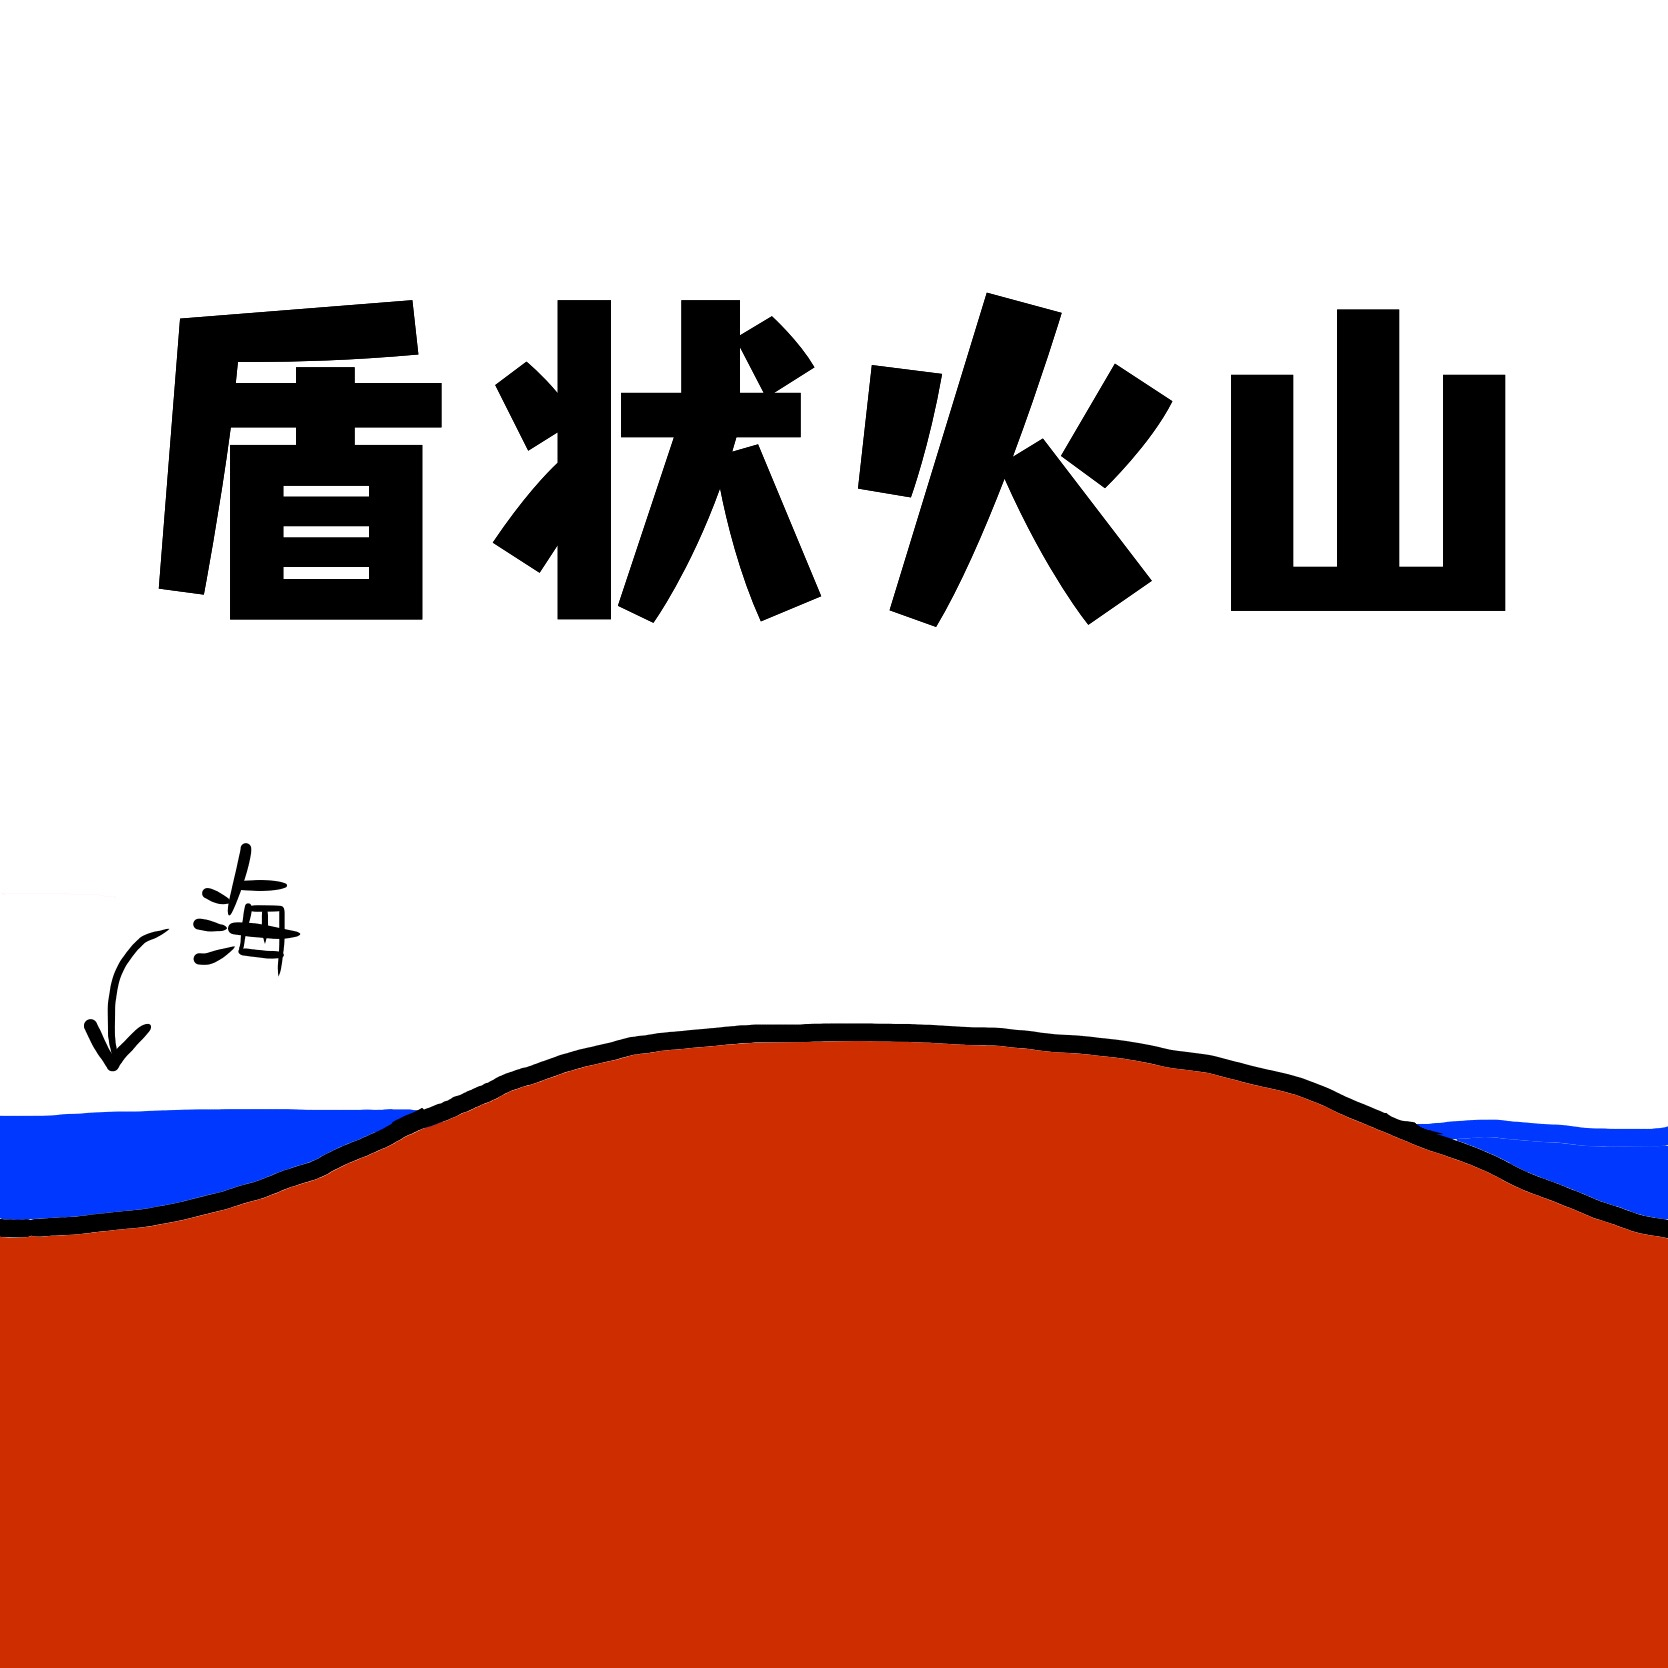 単成火山と複成火山